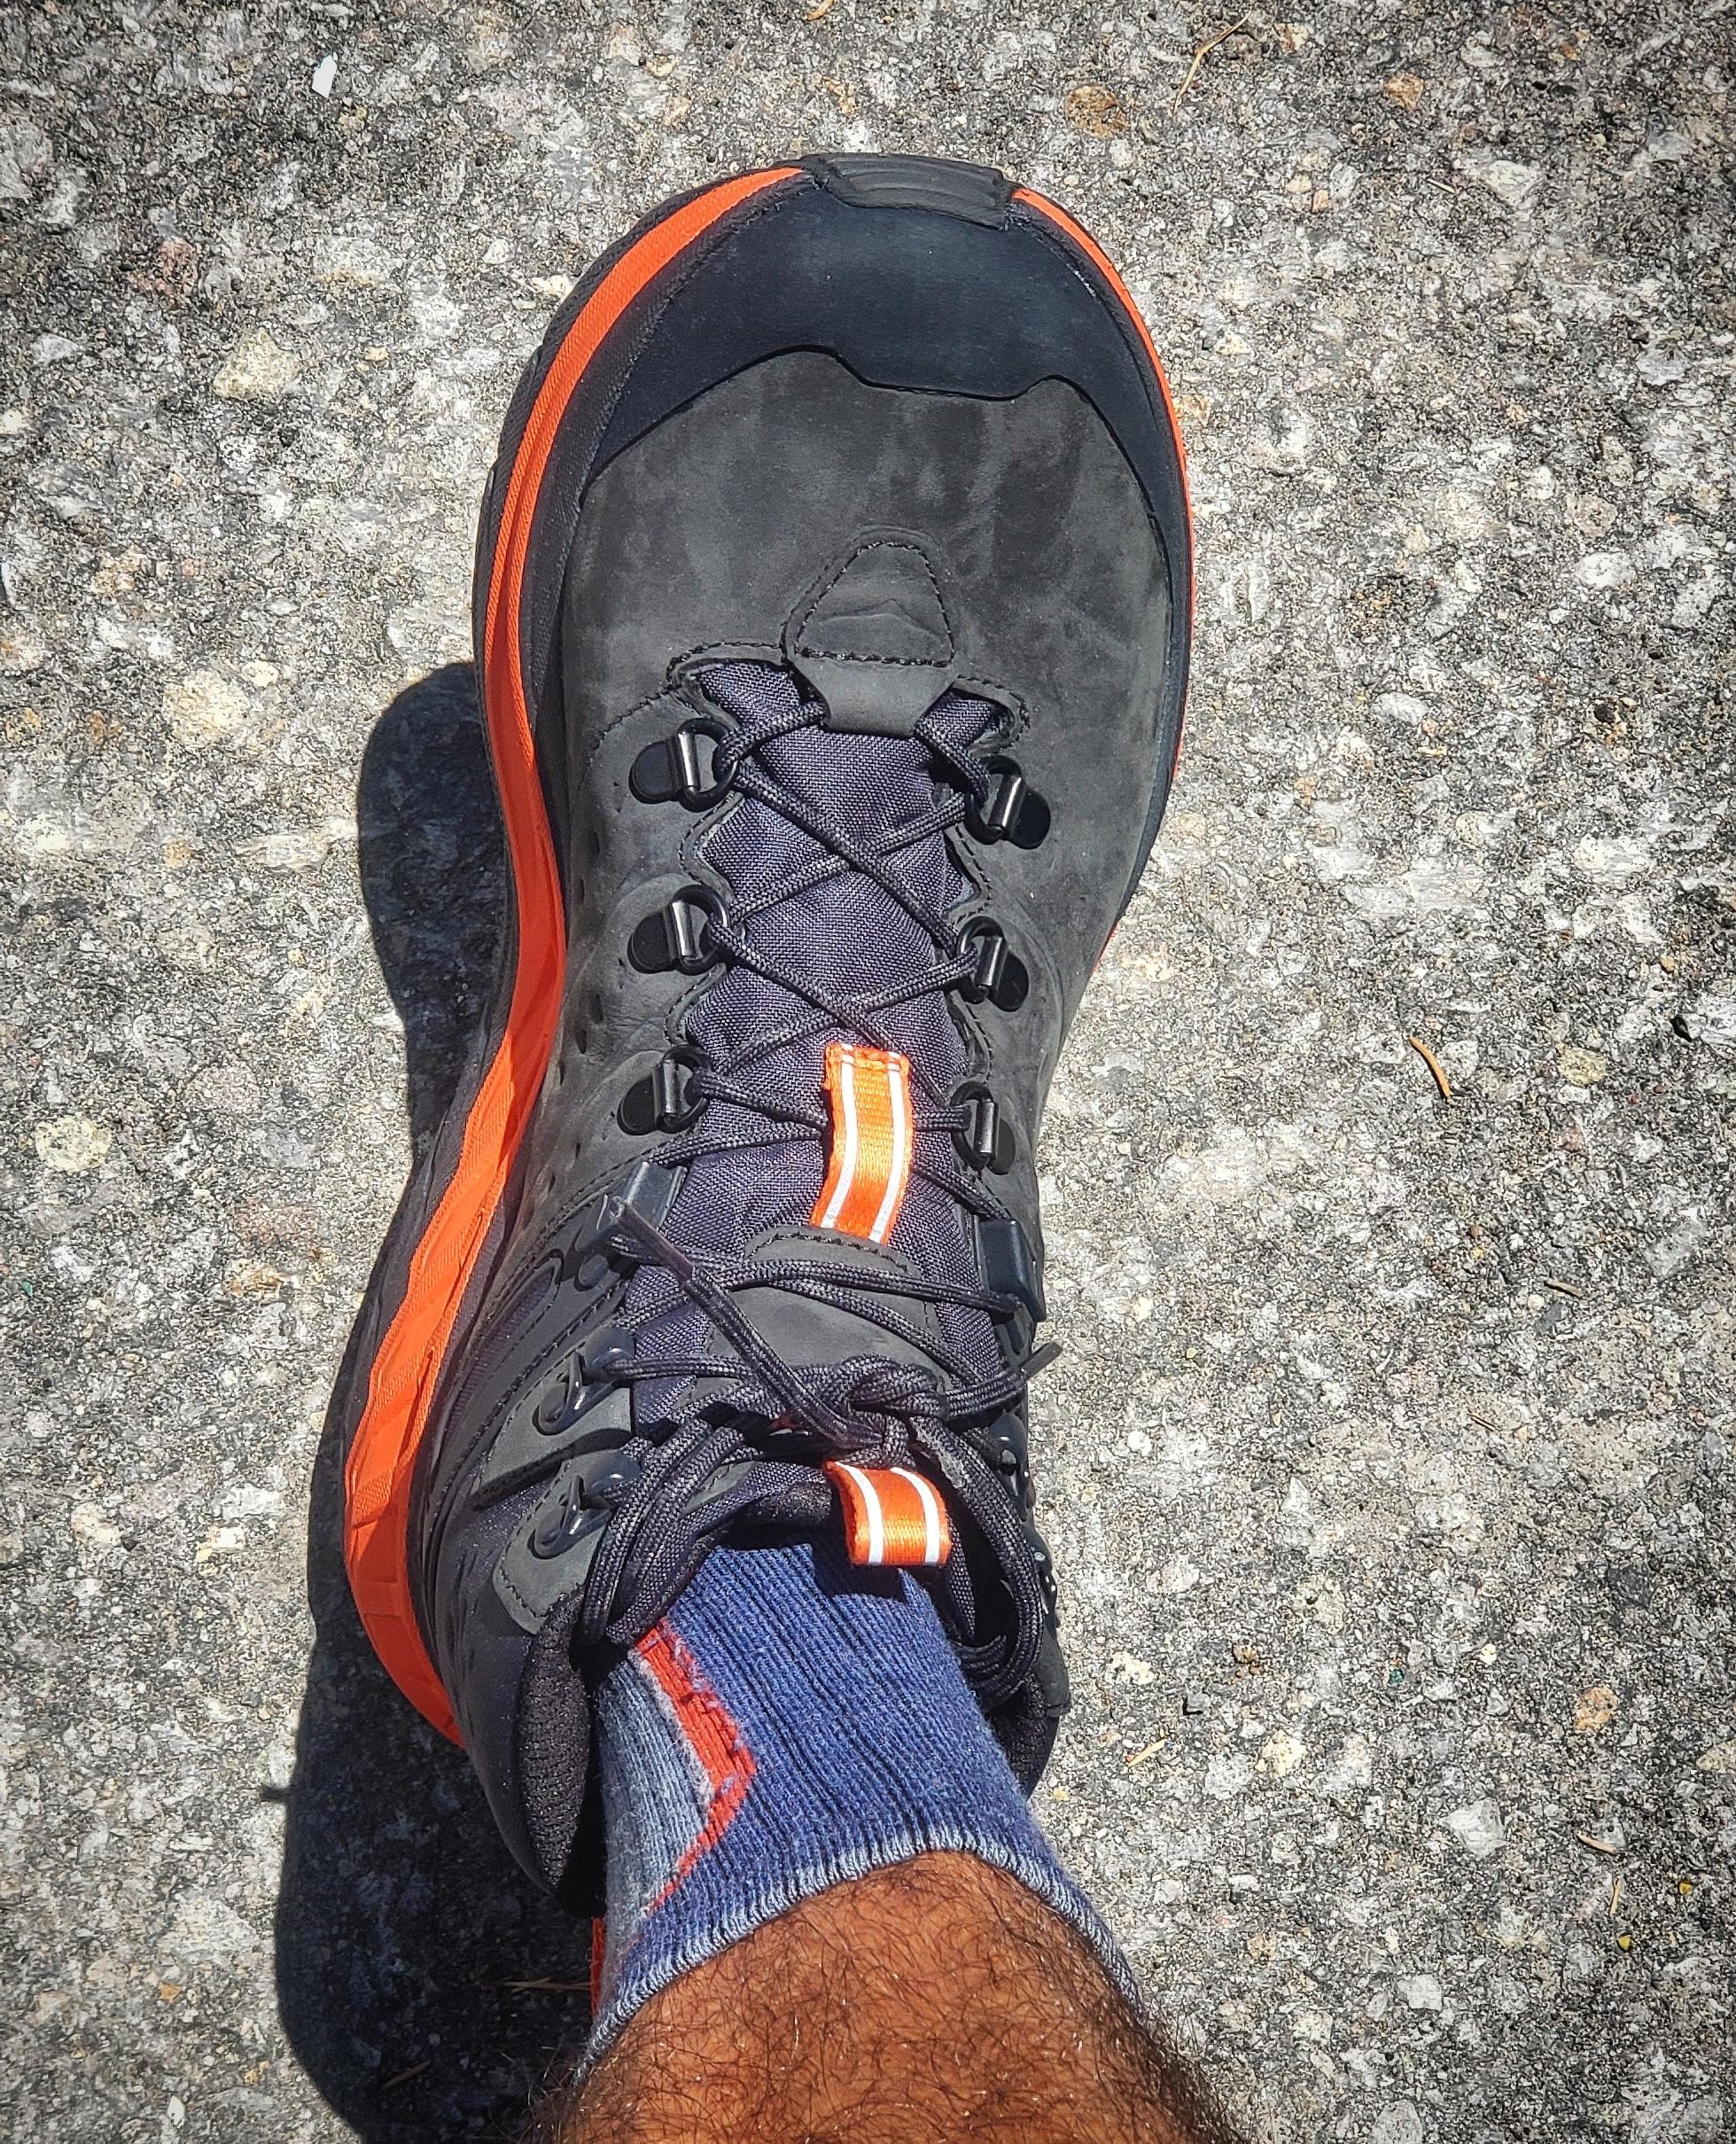 Hoka One One Stinson Mid GTX Hiking Shoe - at a glance